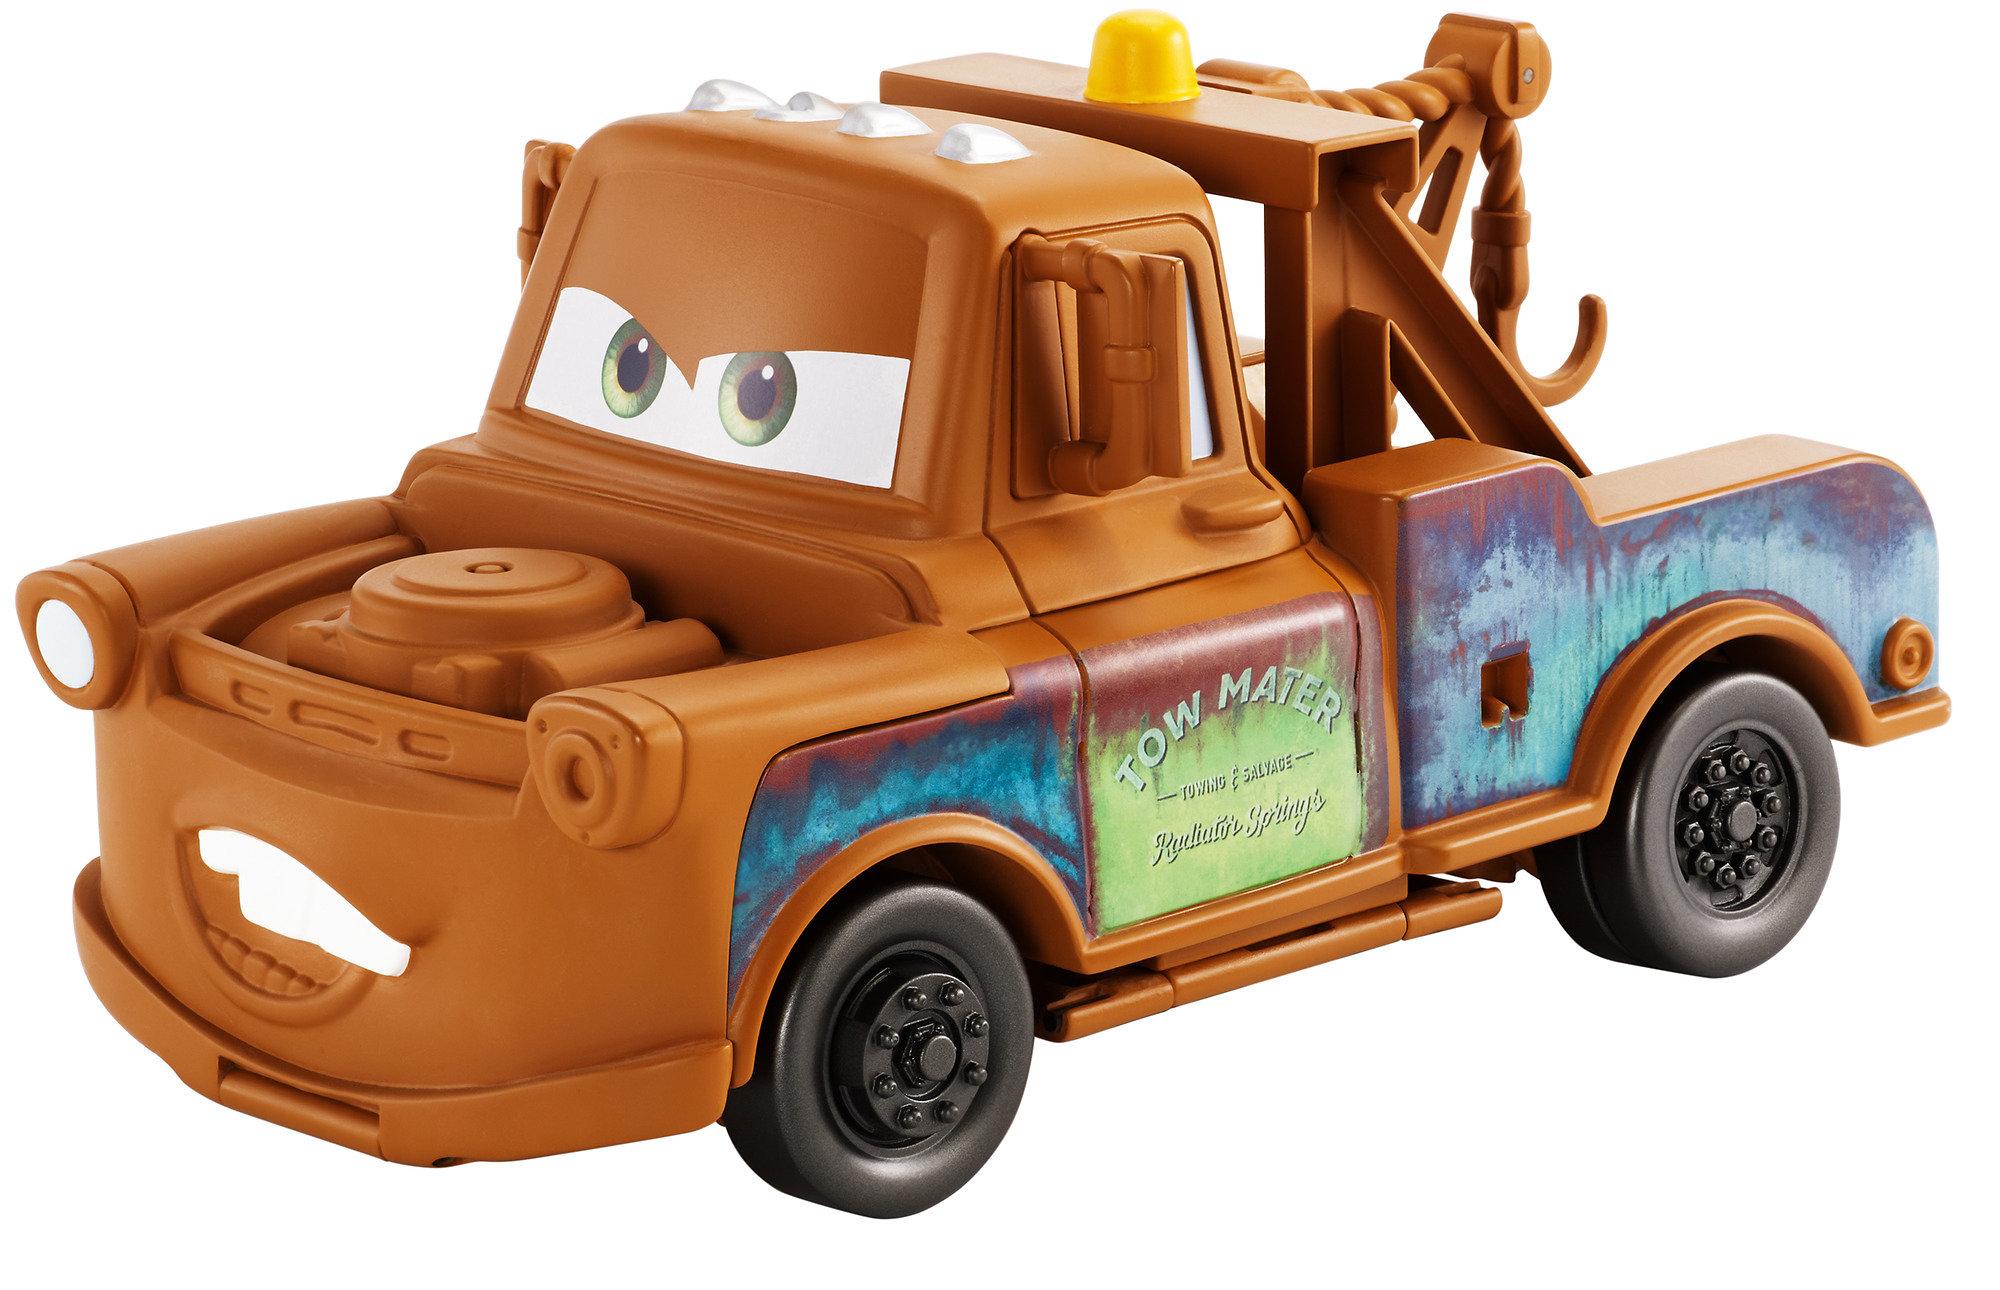 Disney Pixar Cars 3 Transforming Mater Playset by Mattel